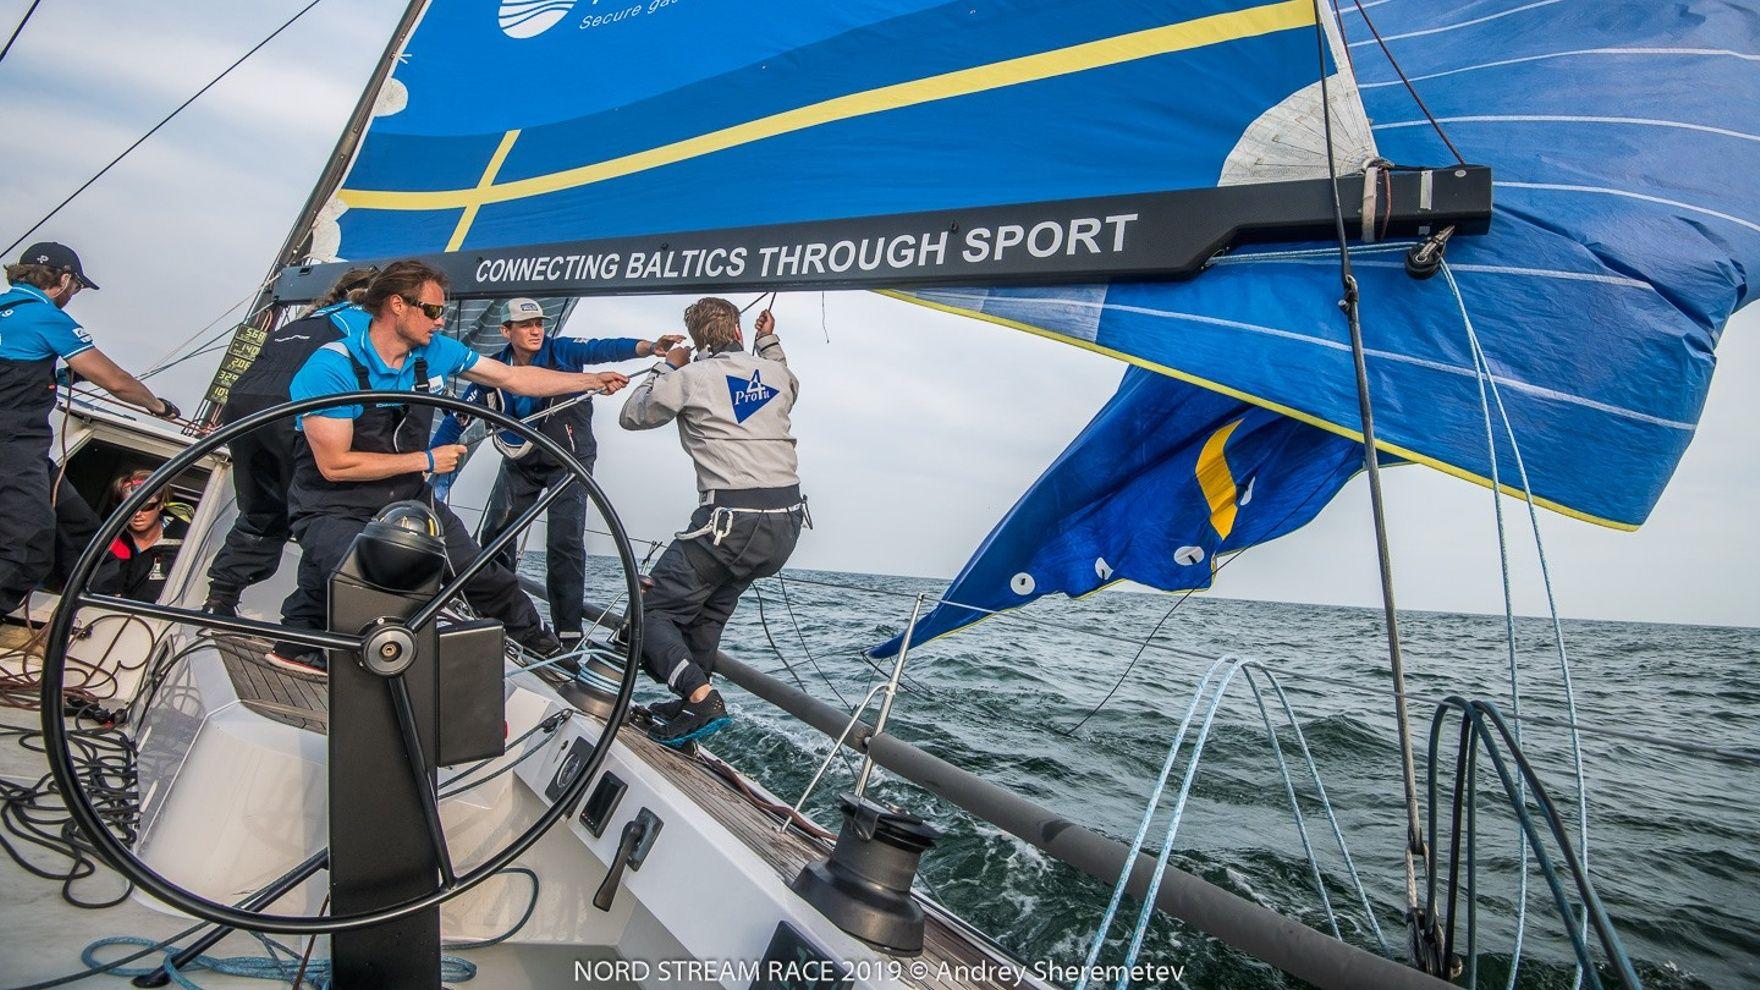 Nord Stream Race 2020: Copenhagen -- Stockholm